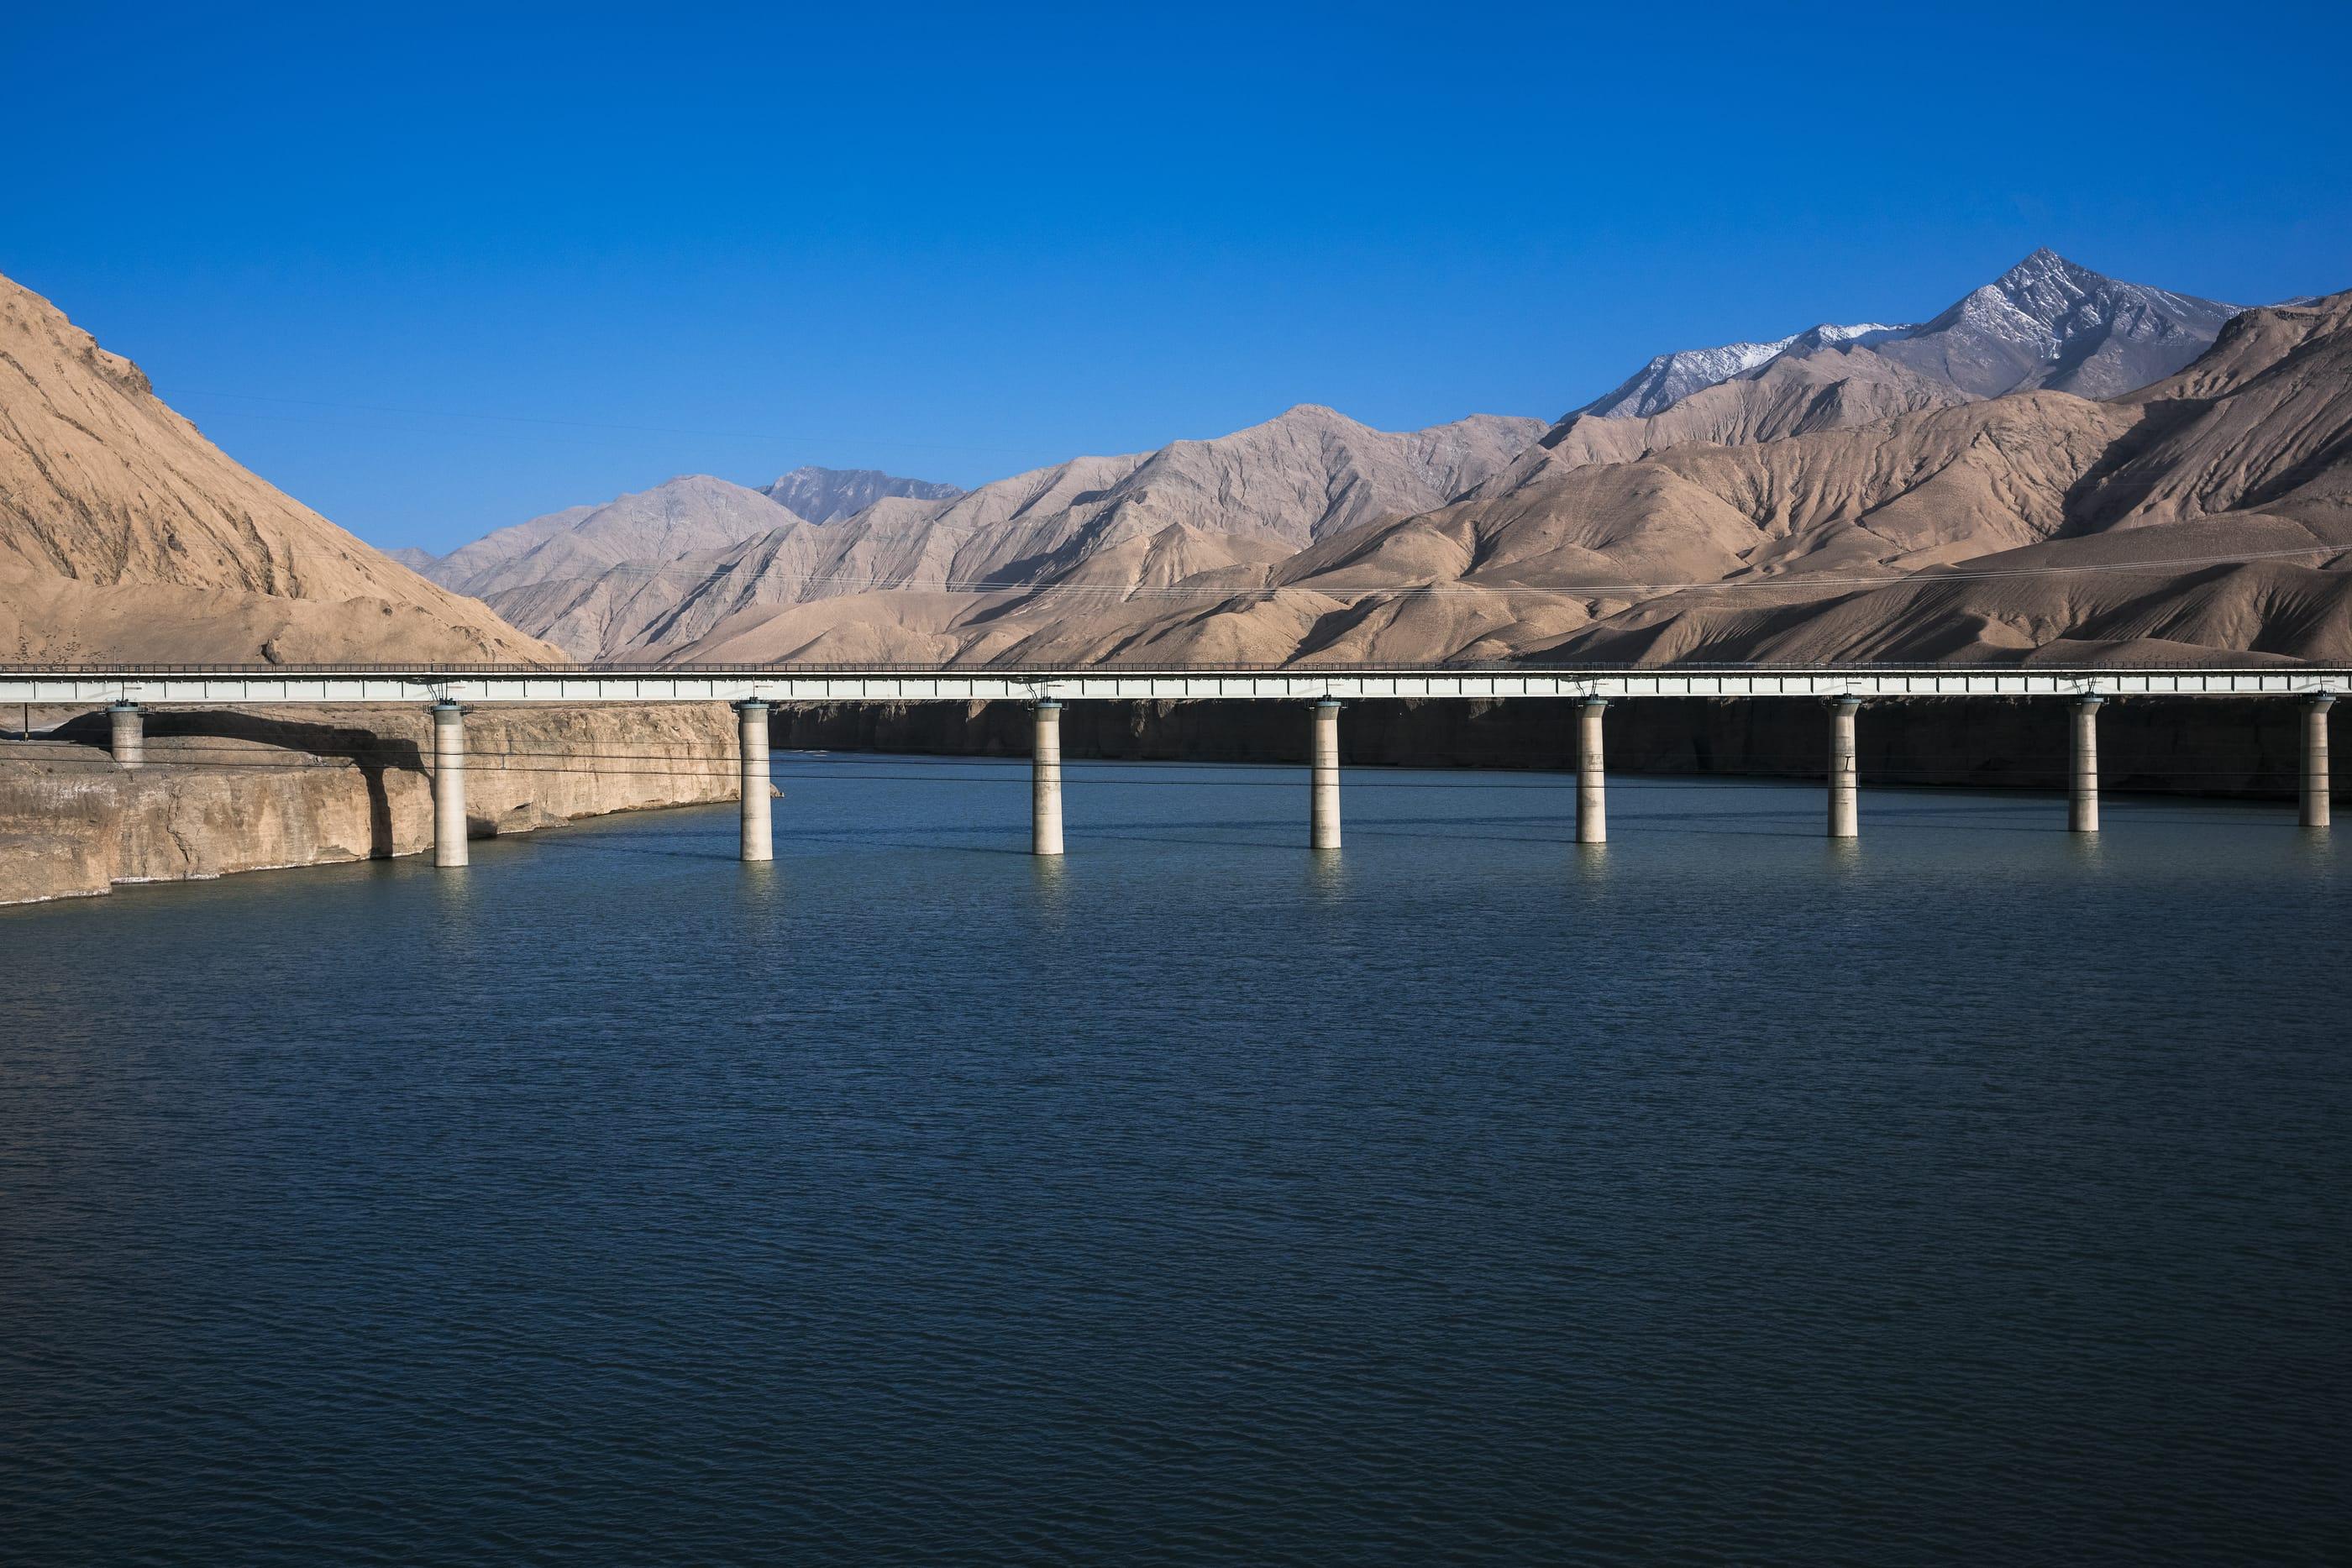 Qinghai-Tibet railway, Tibet Autonomous Region